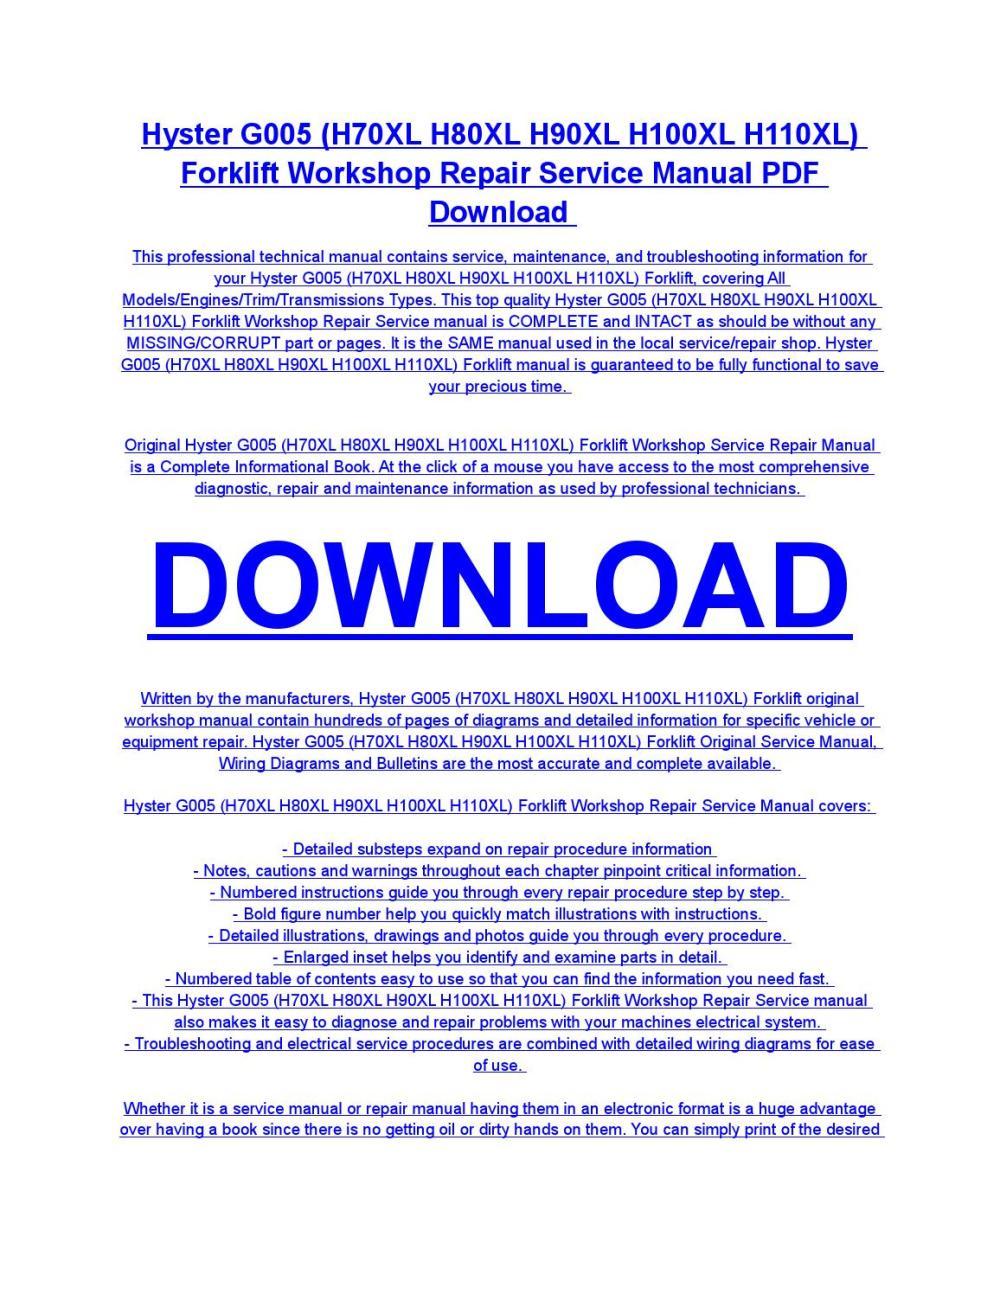 medium resolution of hyster g005 h70xl h80xl h90xl h100xl h110xl forklift service repair workshop manual download by diaz rondon issuu